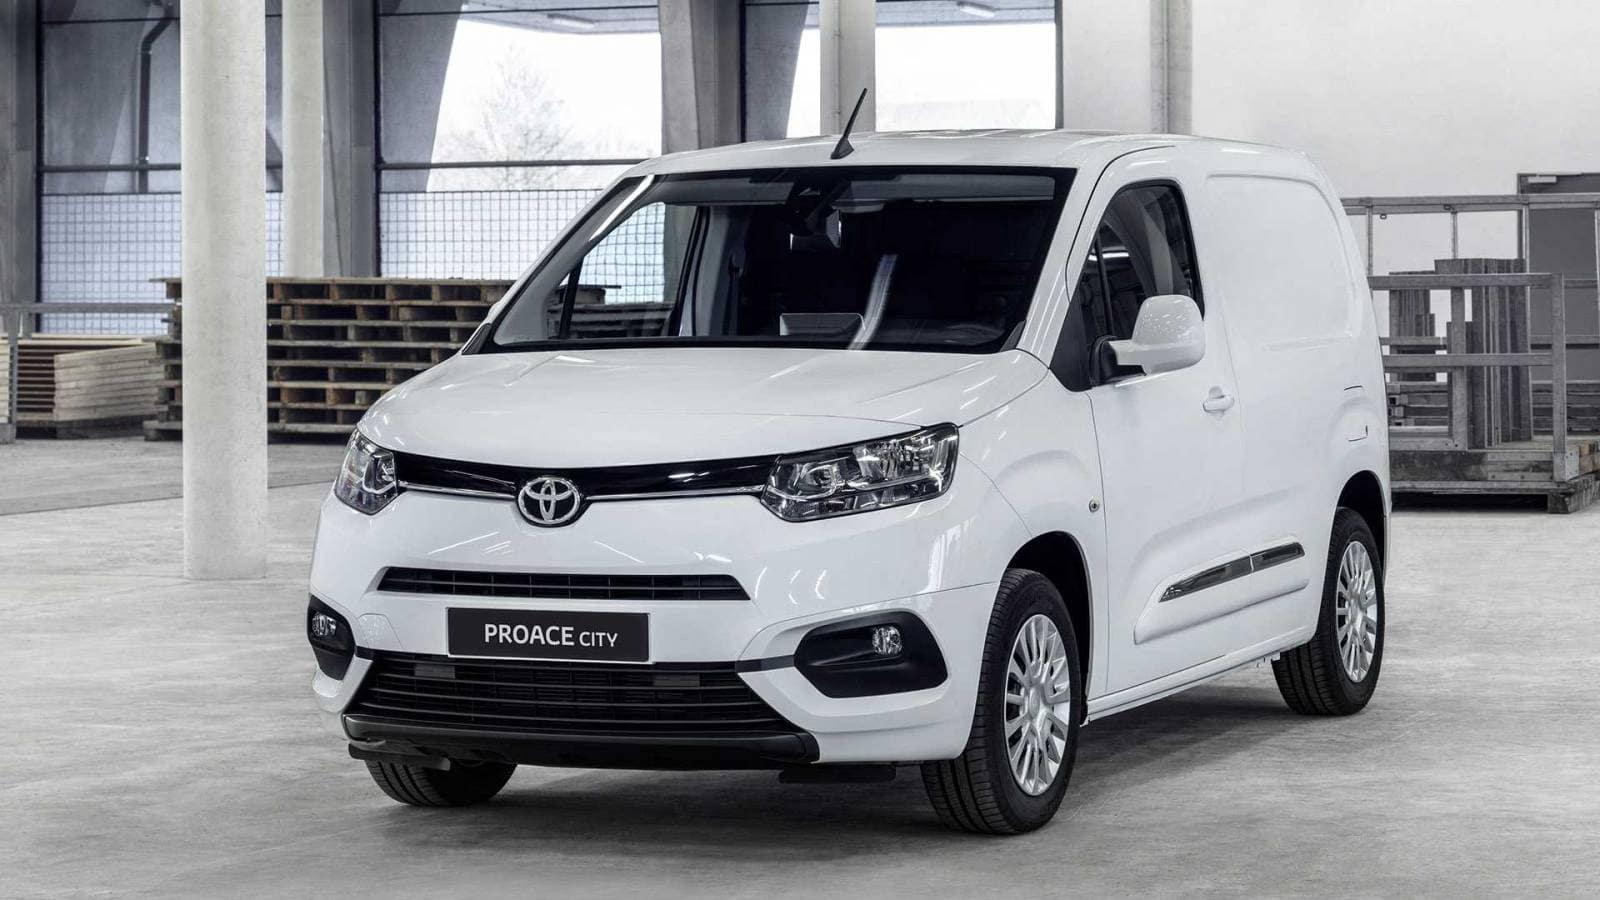 Toyota Proace City Furgon